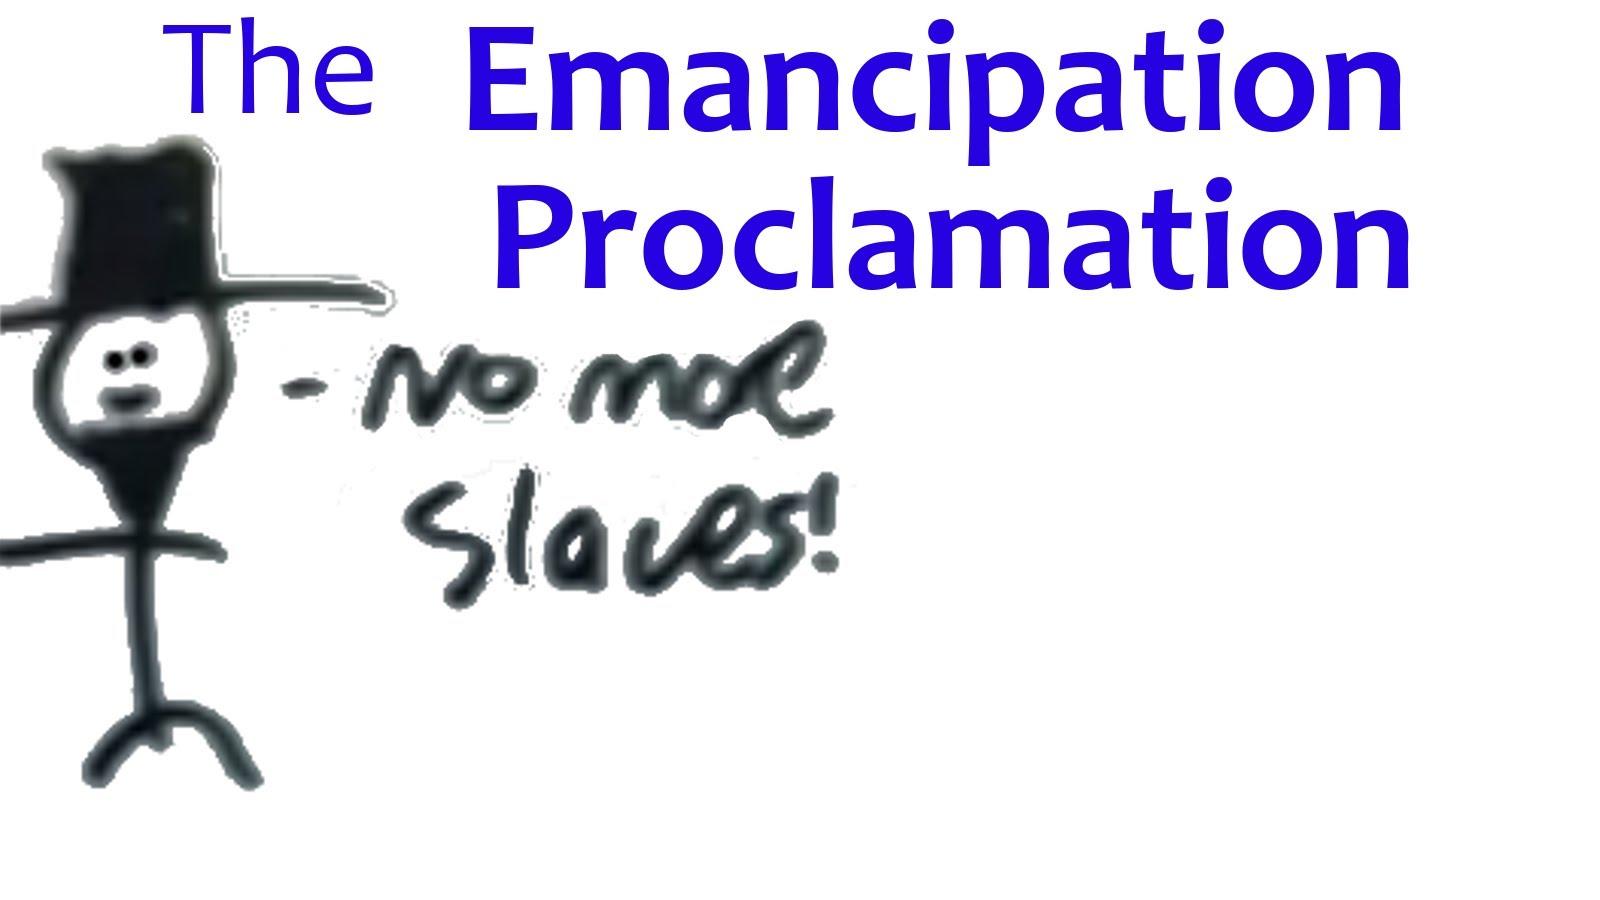 The Emancipation Proclimation